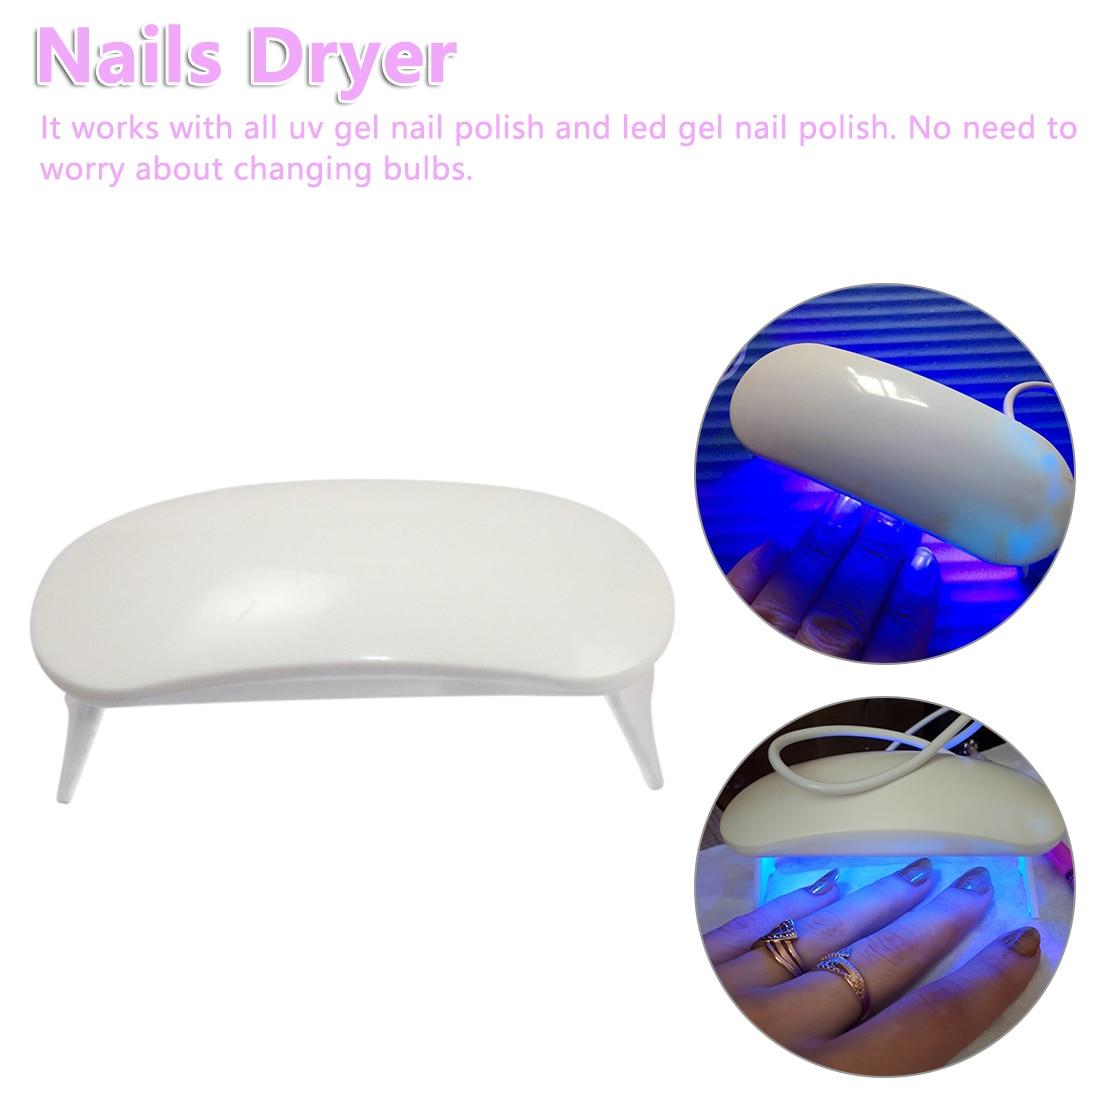 6W White Nail Dryer 3 LED Machine UV LED Lamp Portable Micro USB Cable Nail UV Gel Varnish Dryer